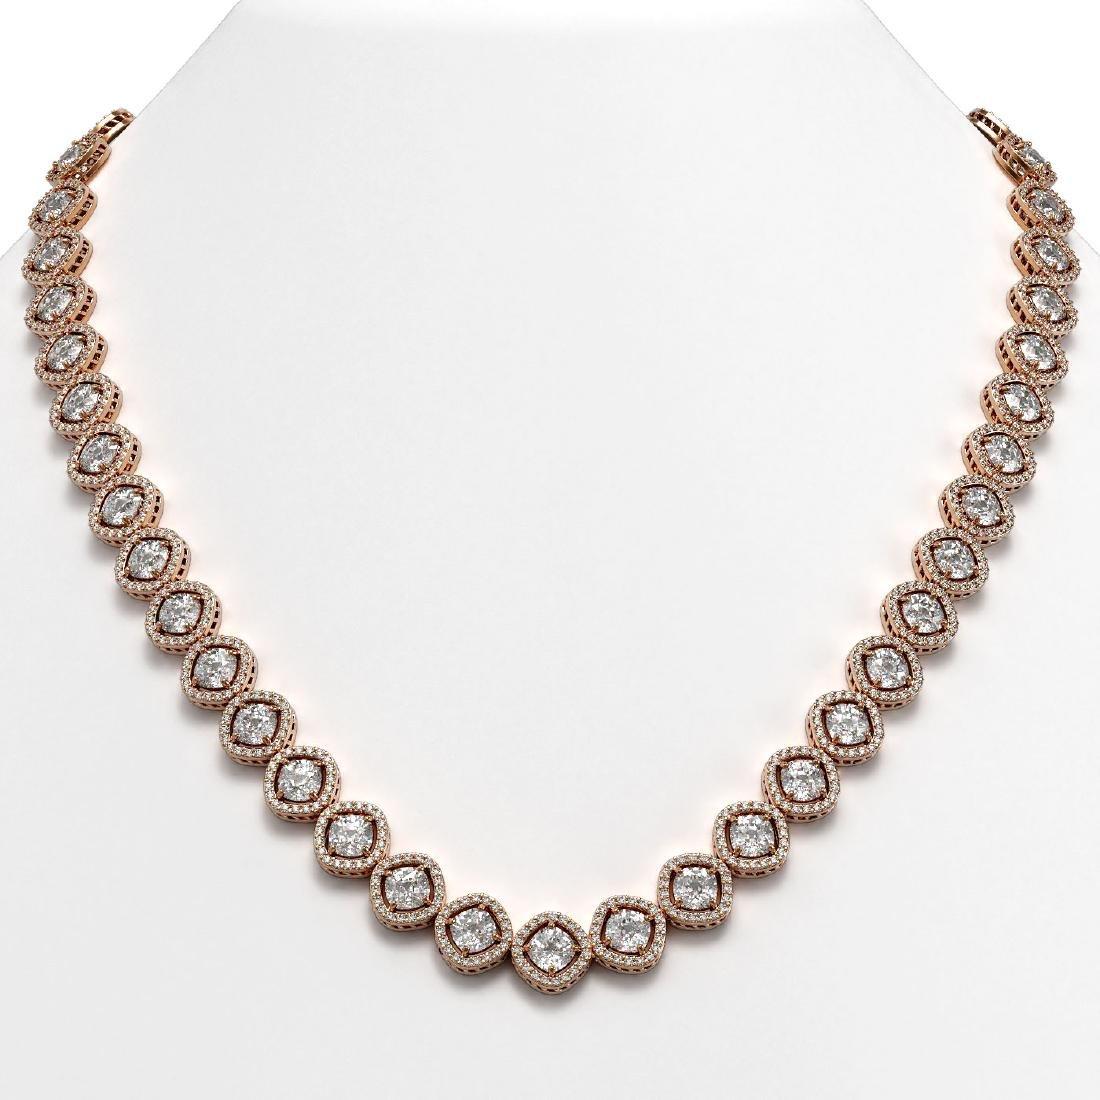 36.09 CTW Cushion Cut Diamond Designer Necklace 18K